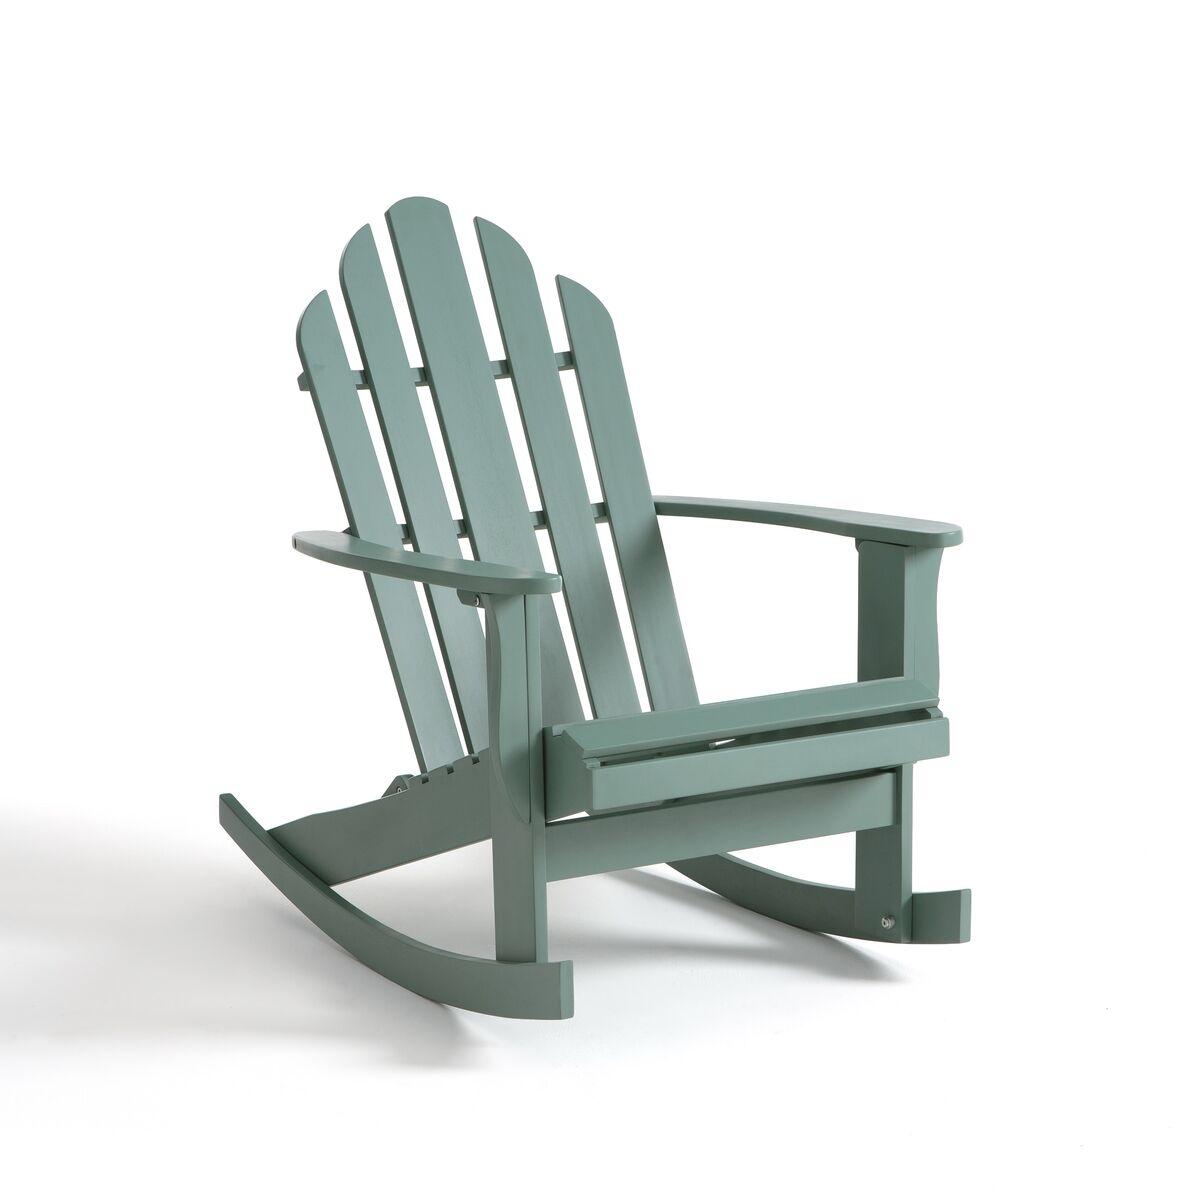 AM.PM Rocking chair de jardin Théodore, style Adirondack